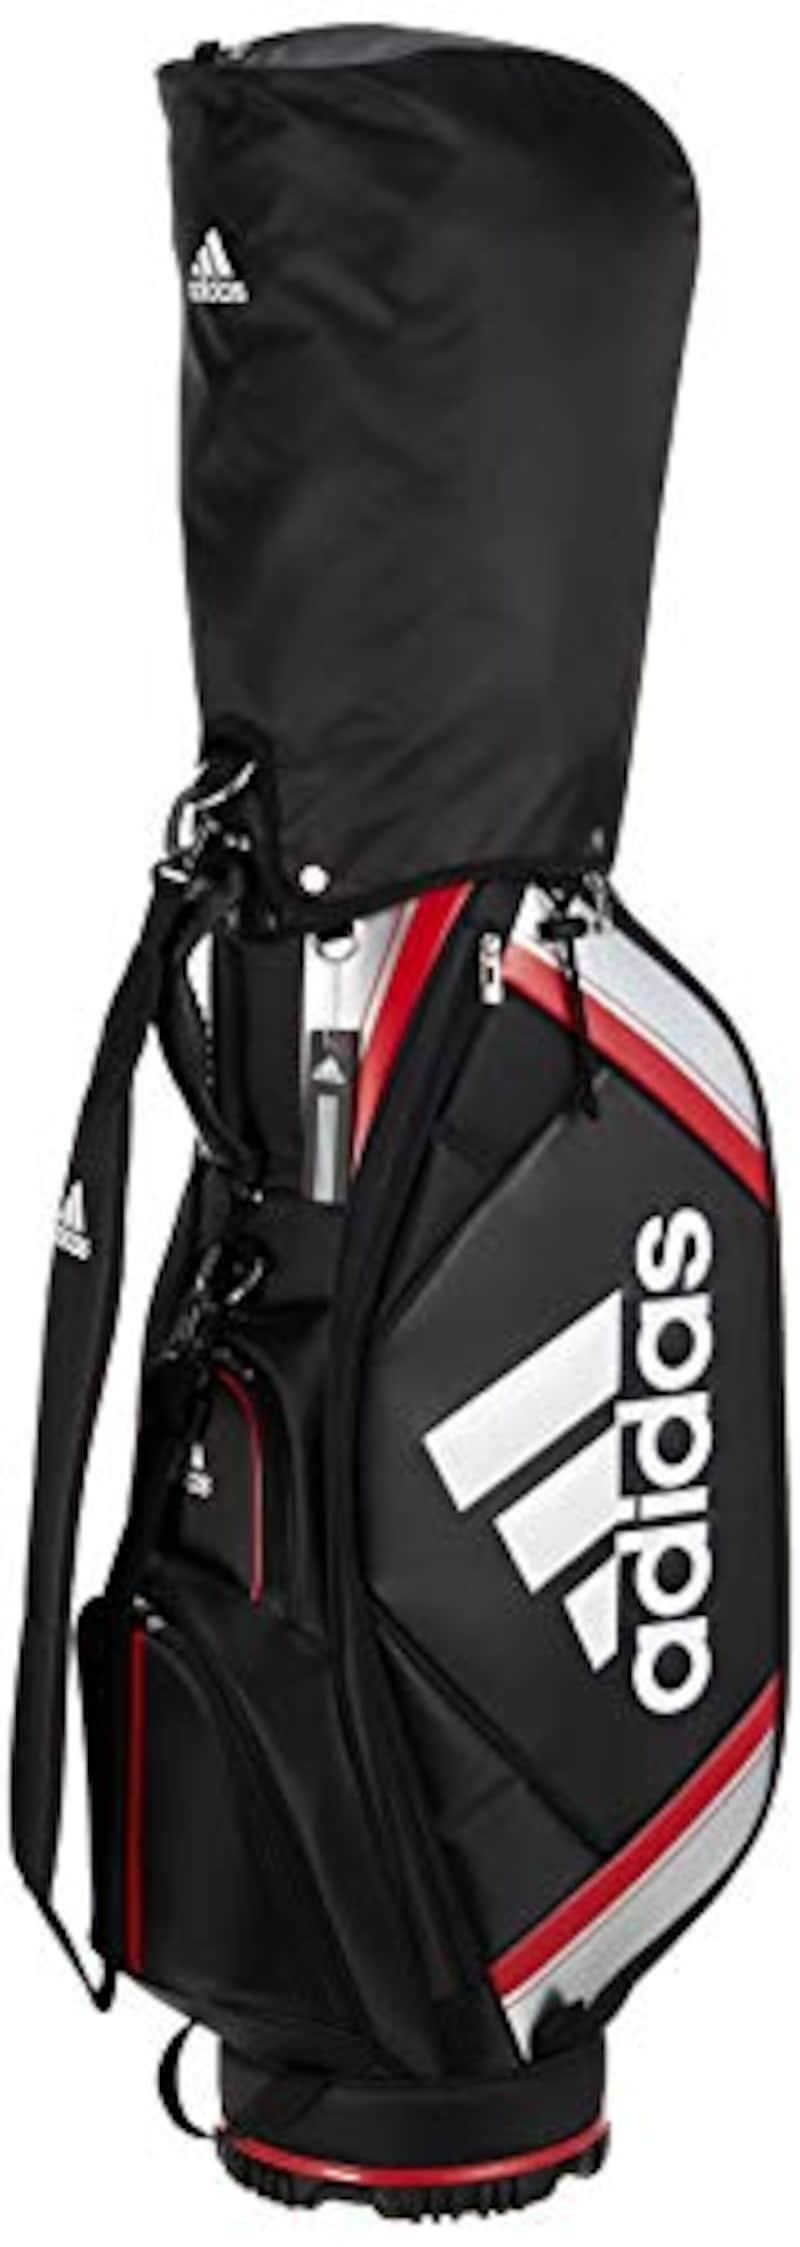 adidas Golf(アディダスゴルフ),AD 19SS,XA227